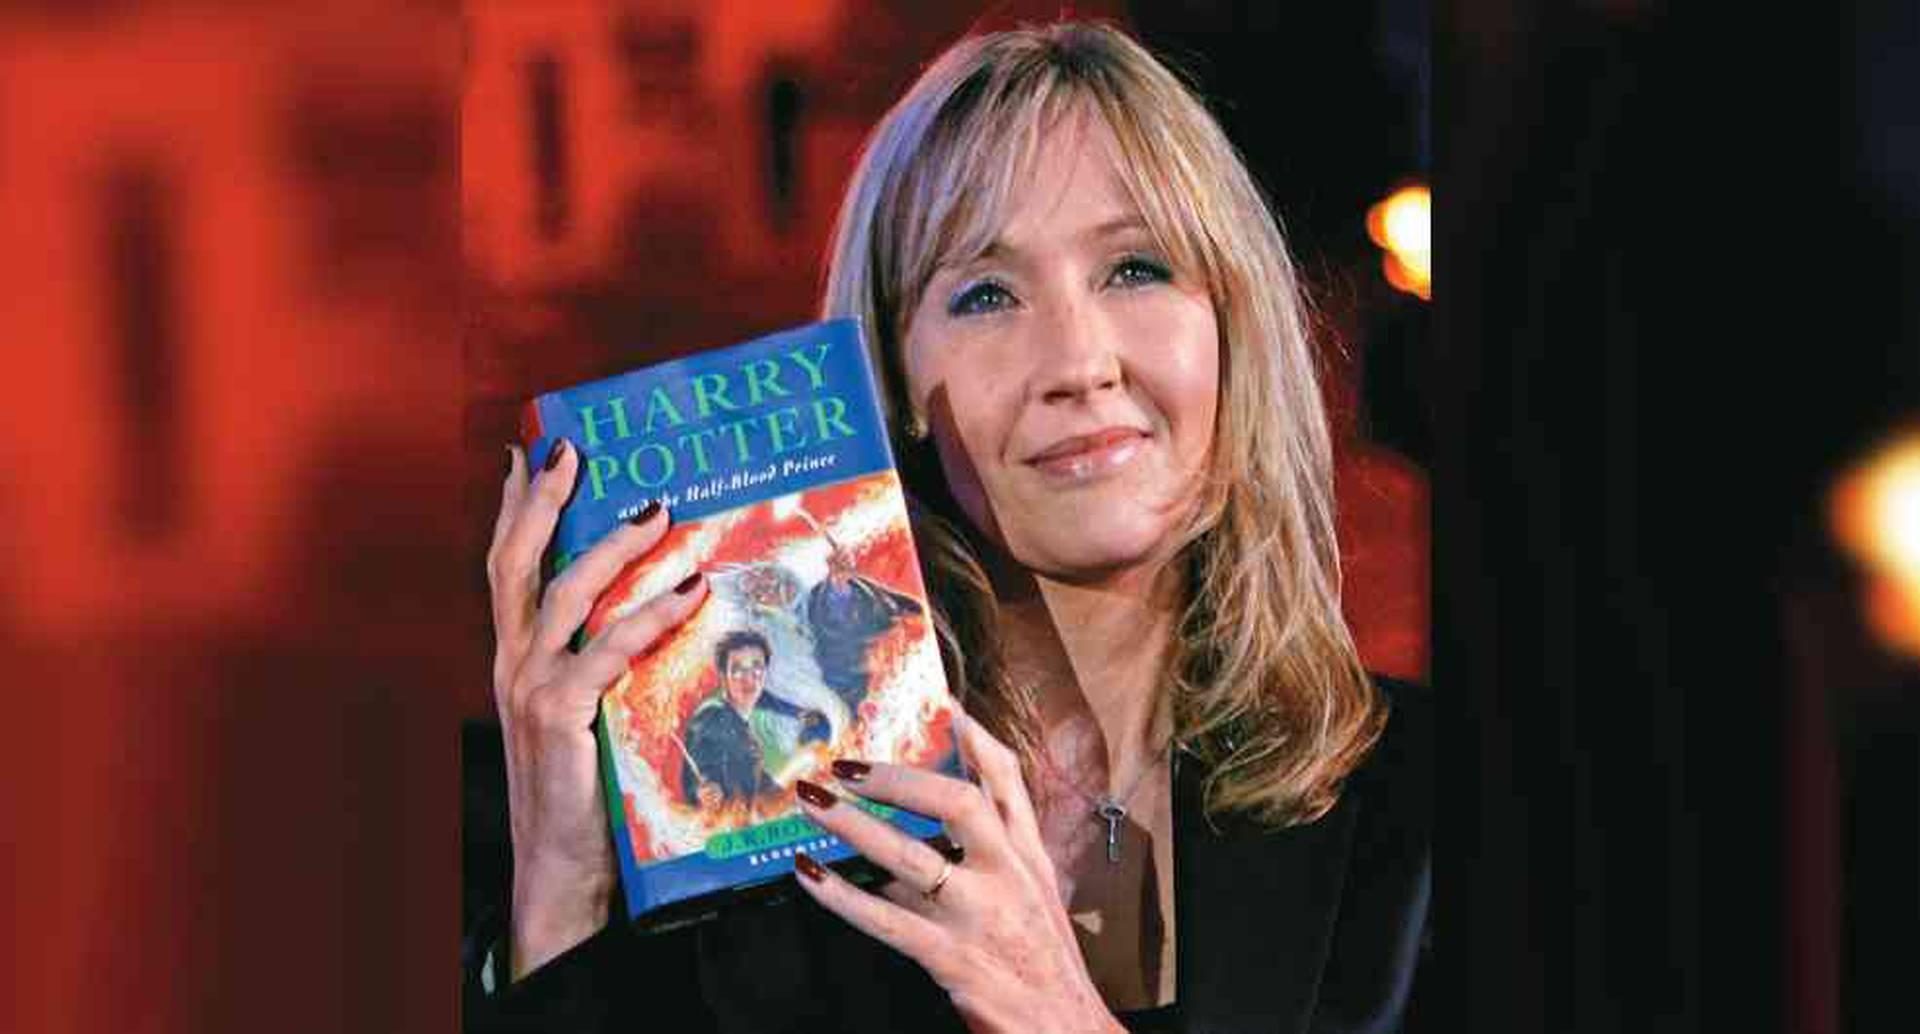 J.K. Rowling responde a acusaciones de transfobia con un libro sobre un travesti asesino